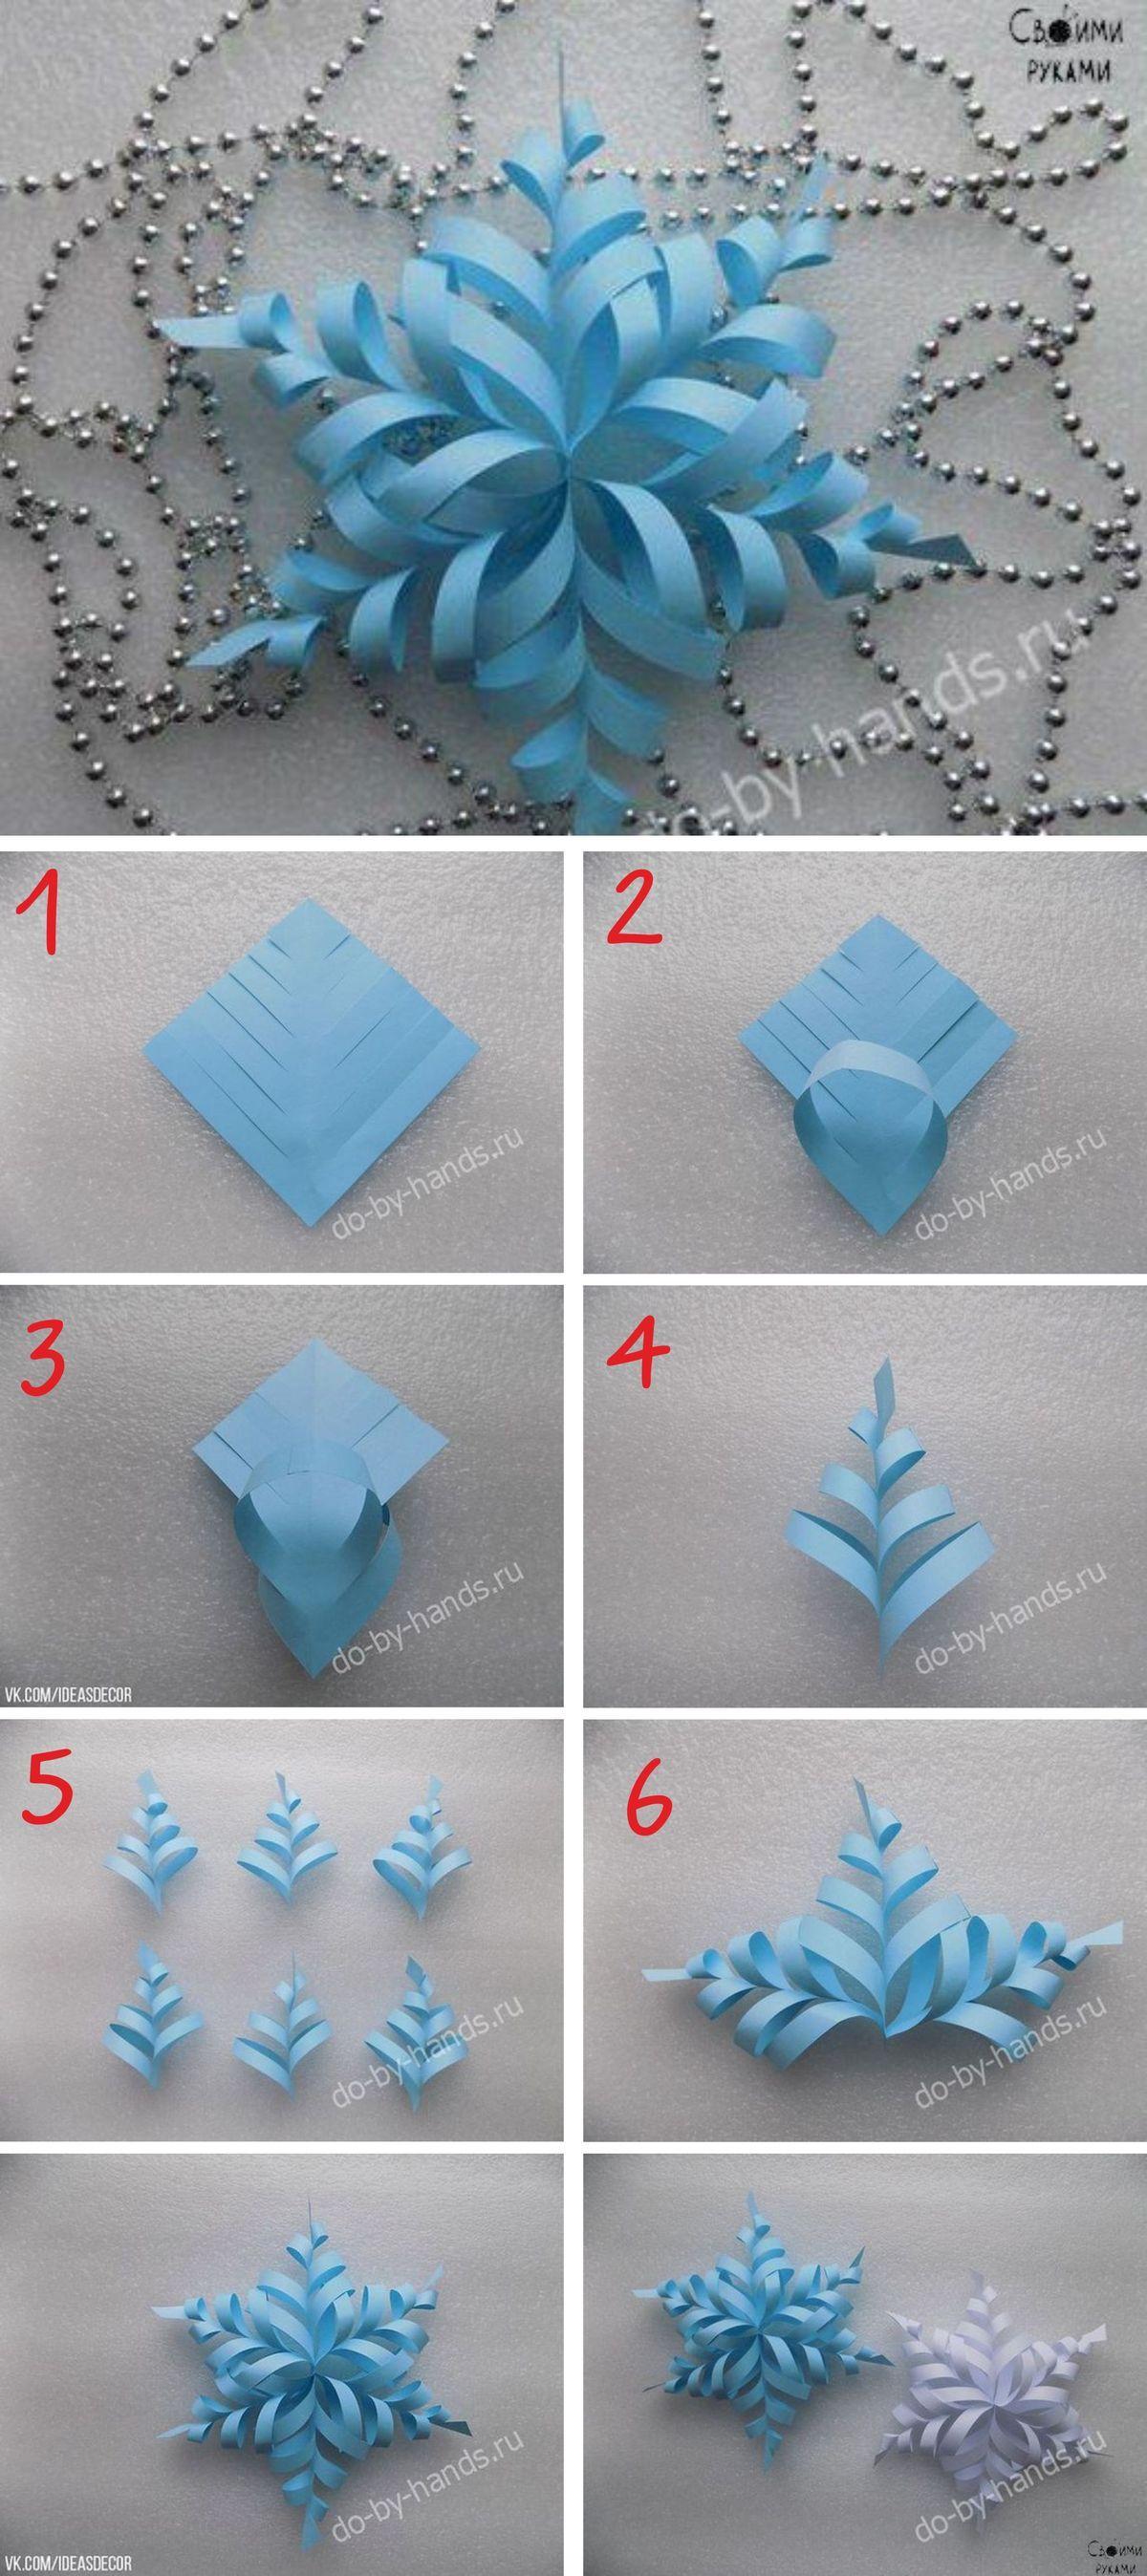 Pin by sahil yadav on Origami hearts